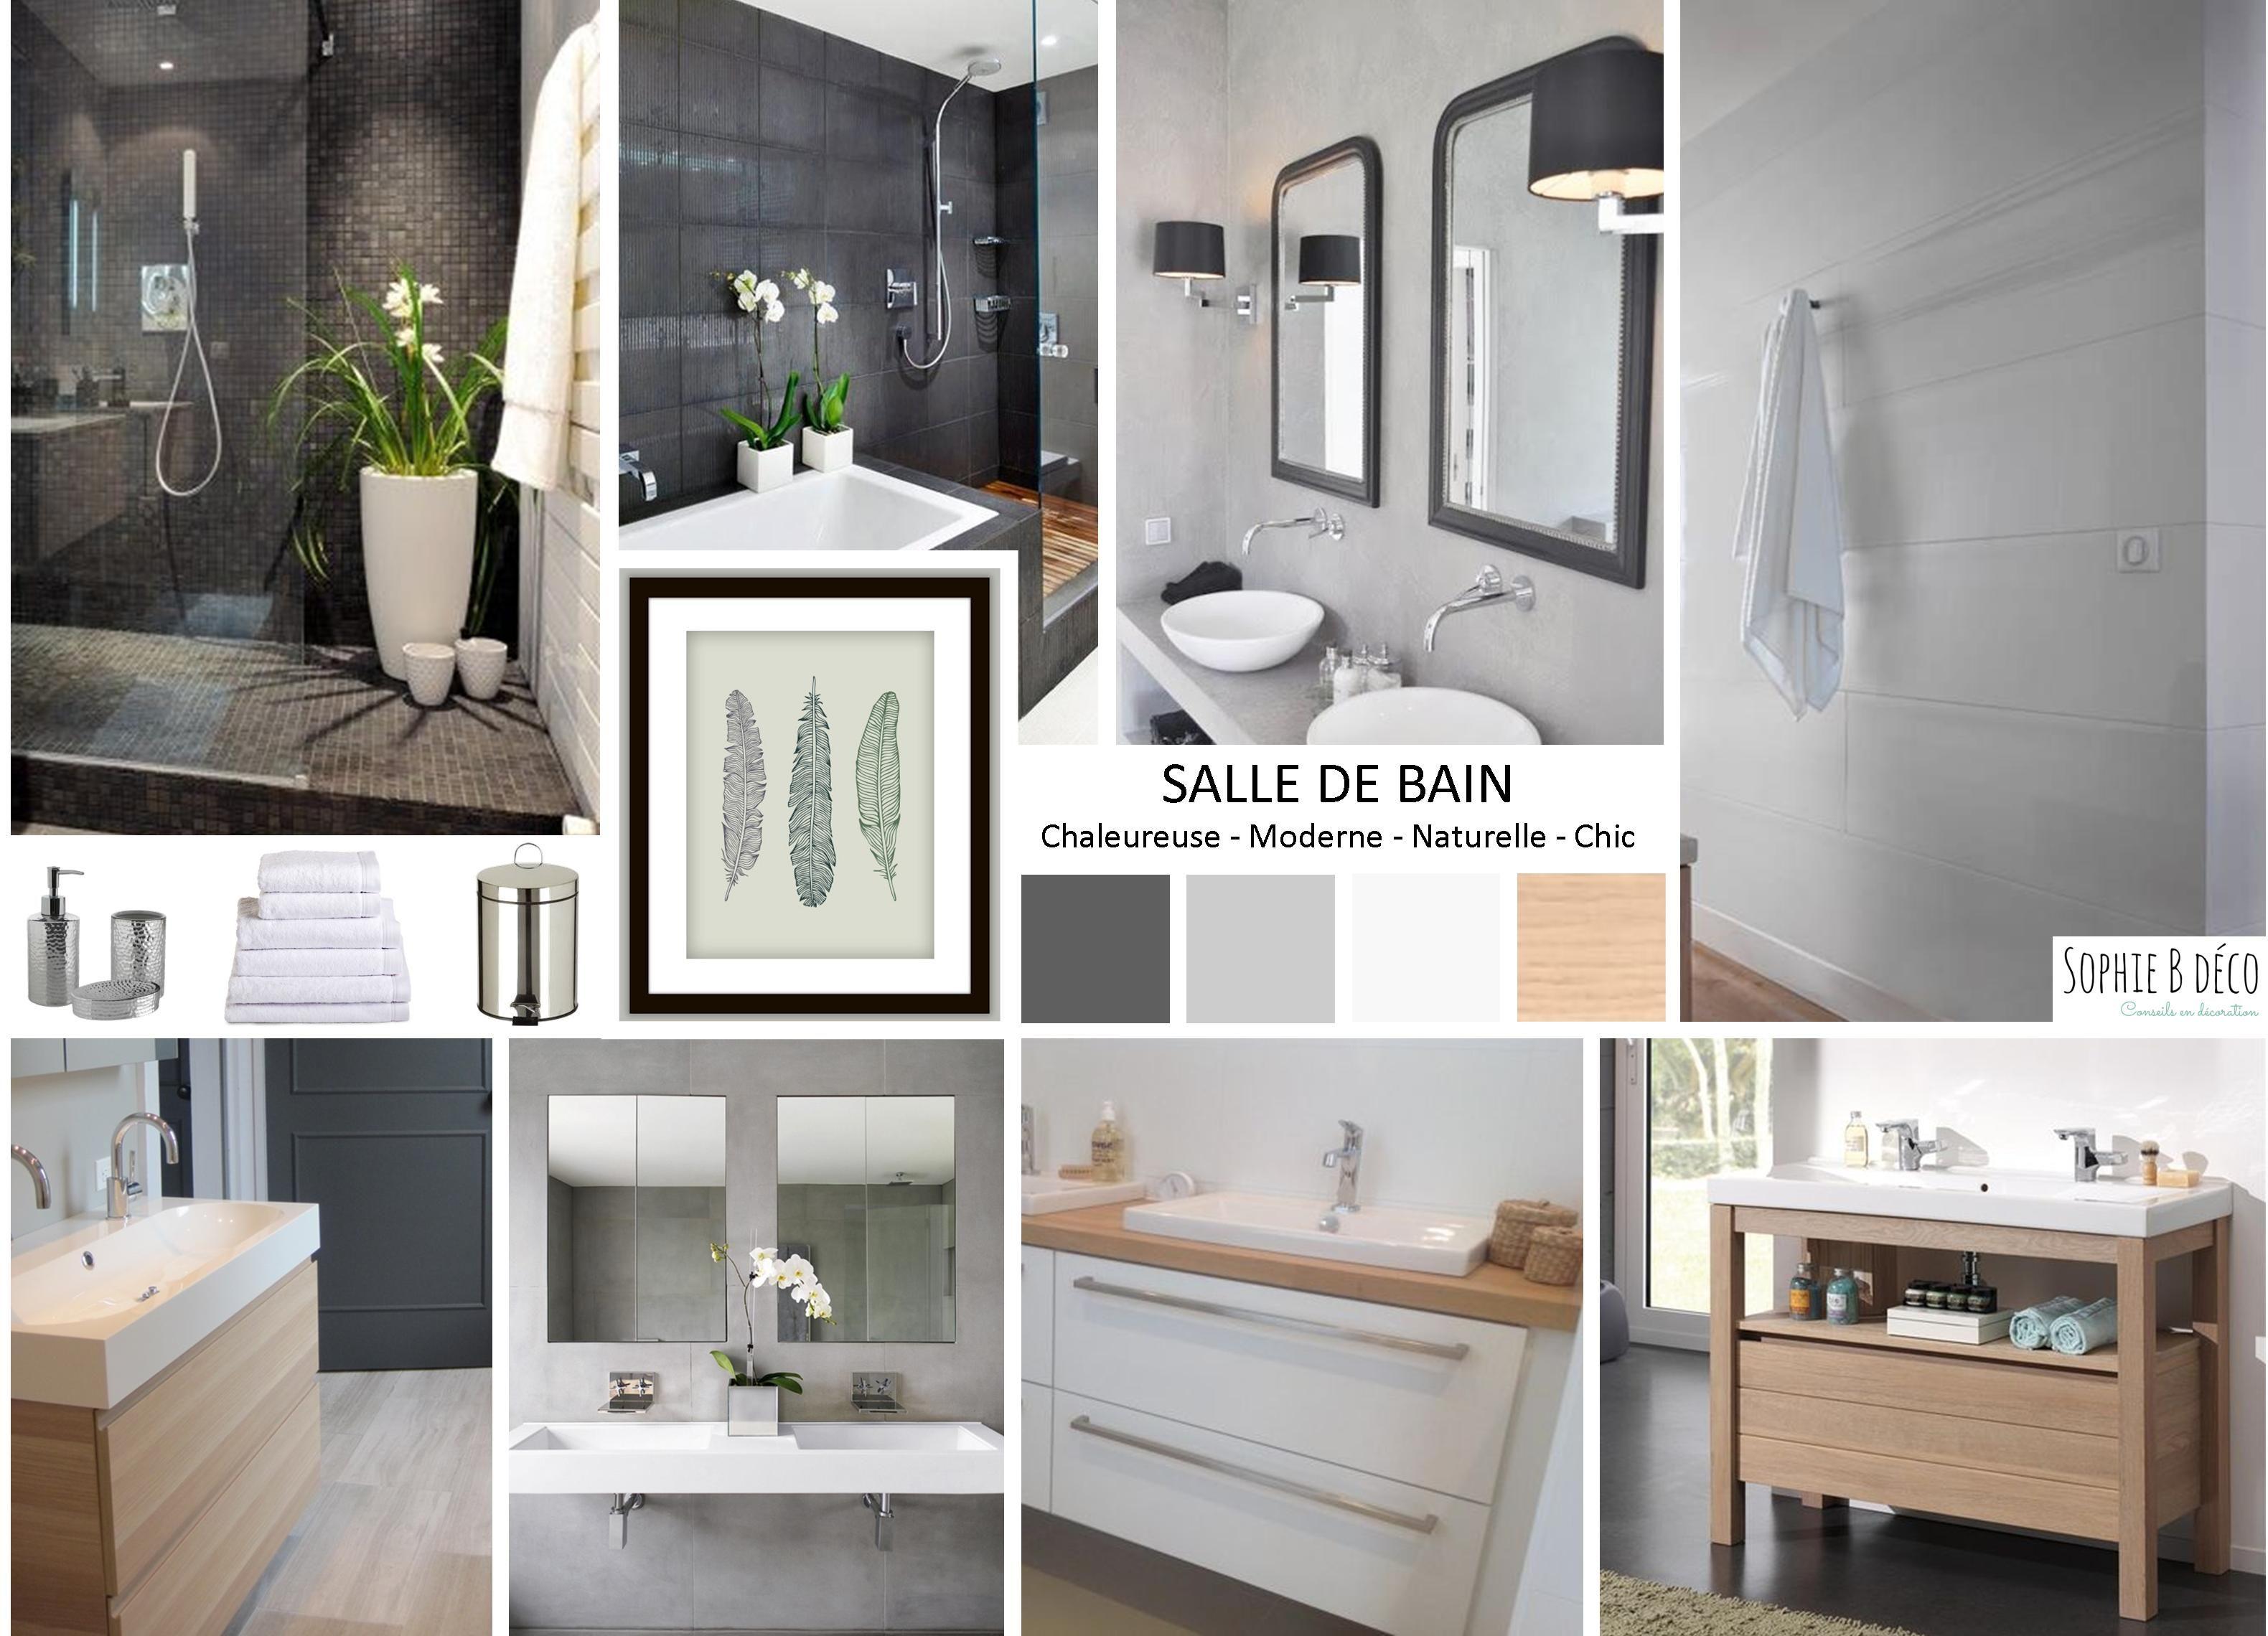 Planche tendance salle de bain en gris blanc et bois for Salle de bain gris bois